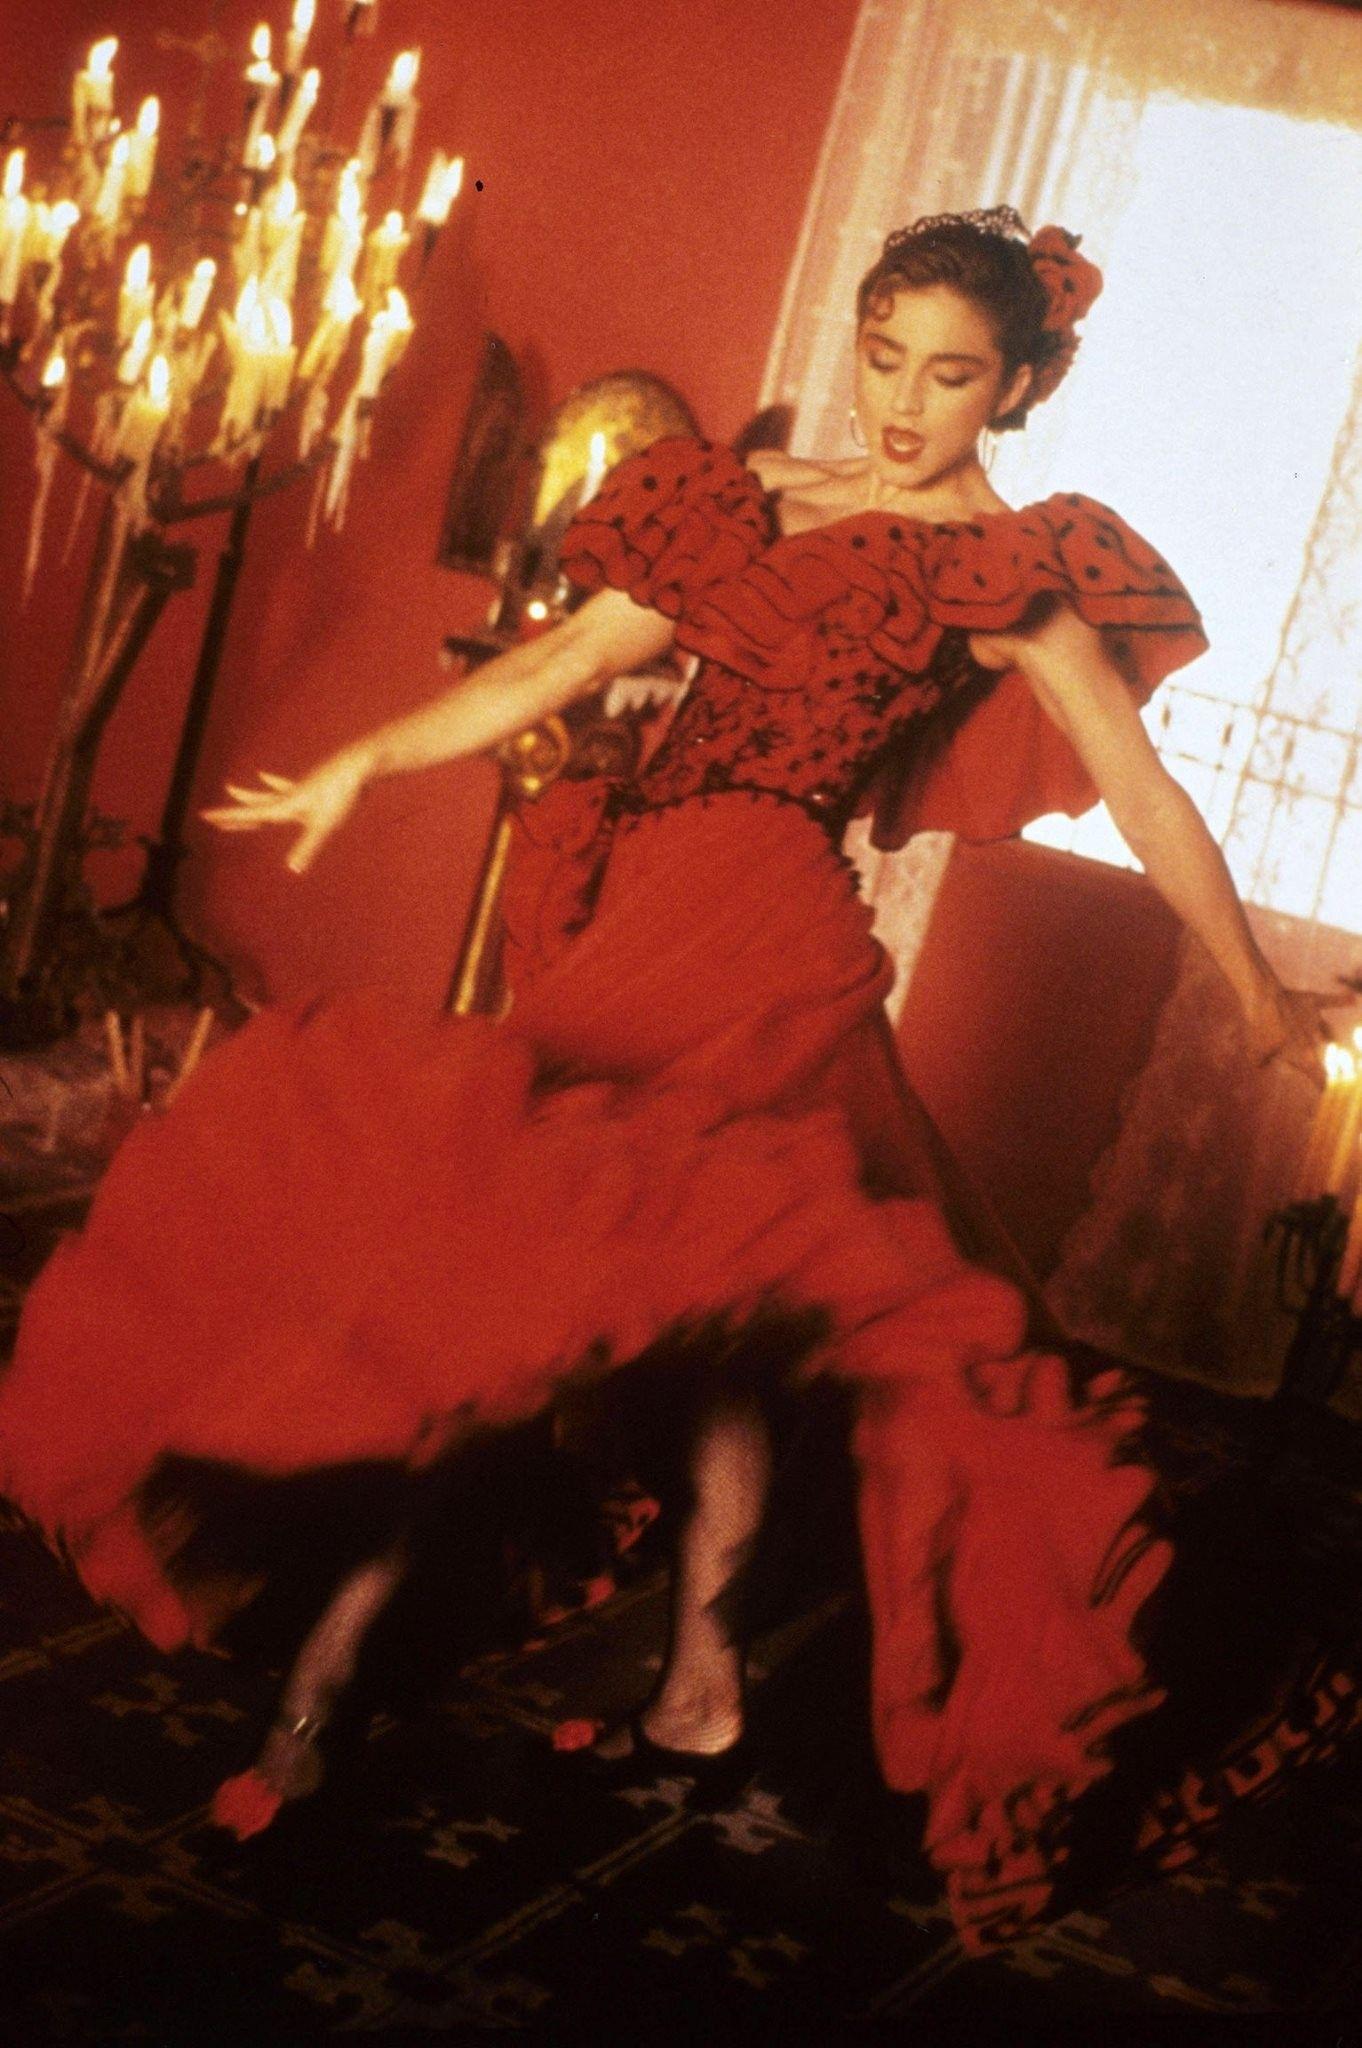 Pin By Sakura On Nutcracker Spanish Chocolate Madonna Vogue Madonna Costume Madonna 80s